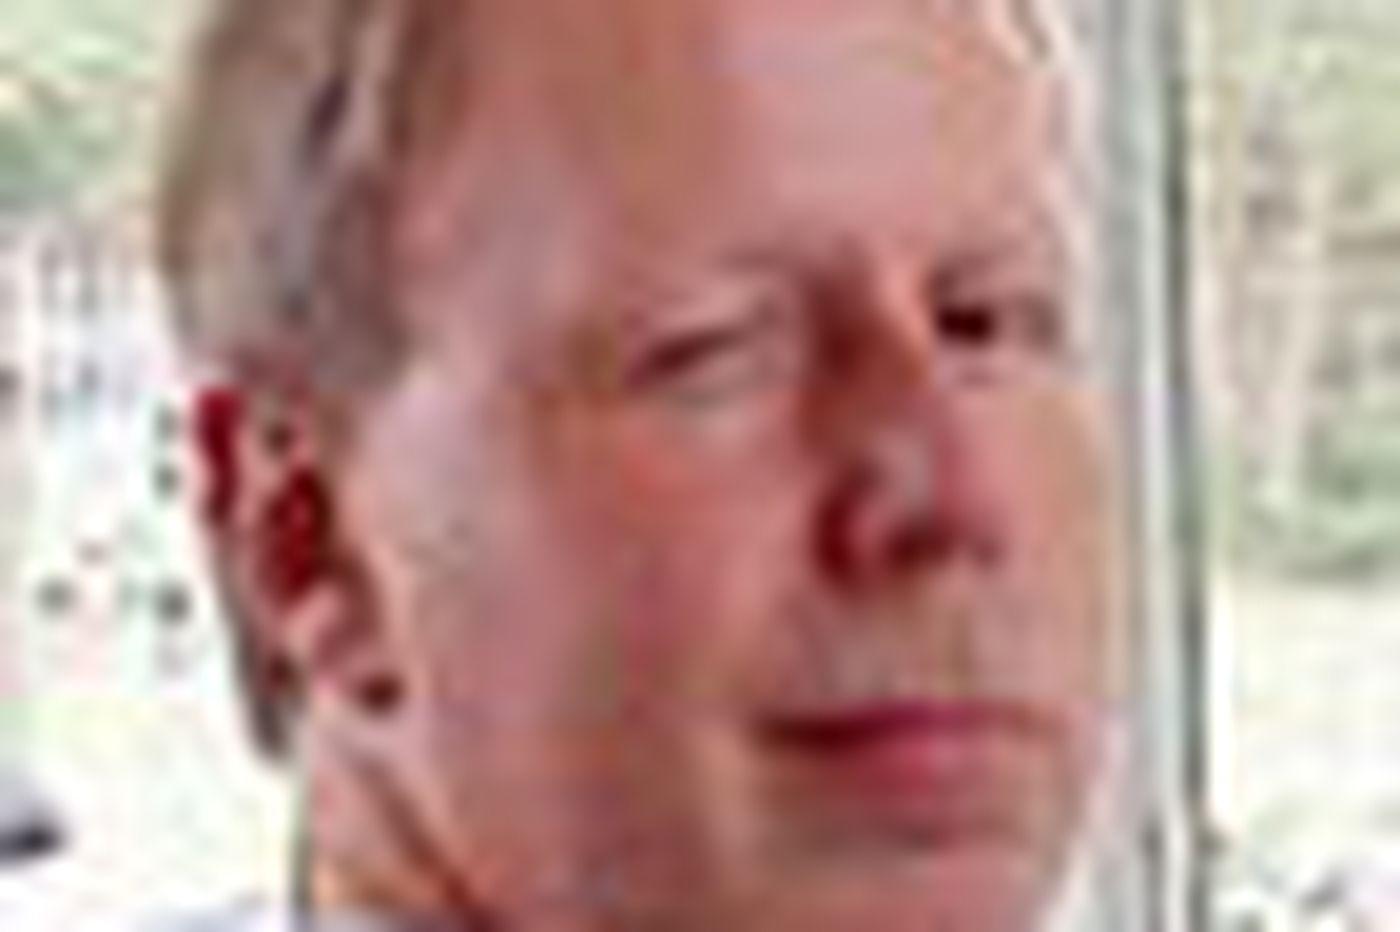 Hardworking dad slain in Olney